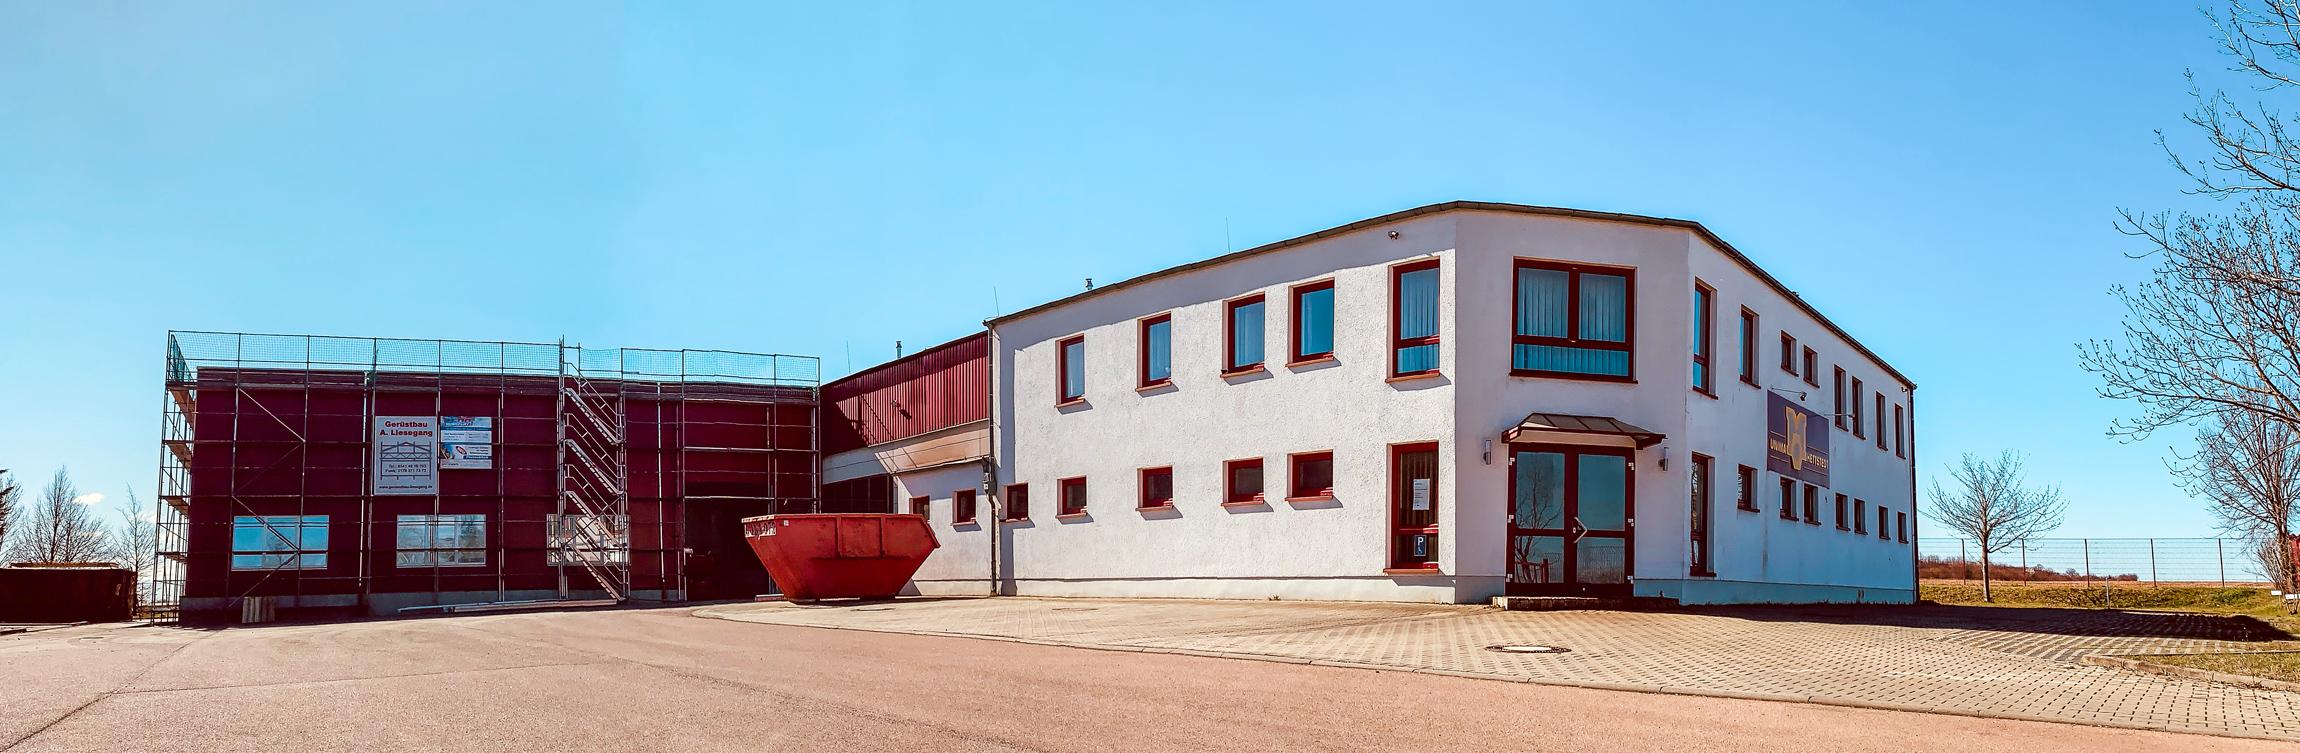 Unima GmbH